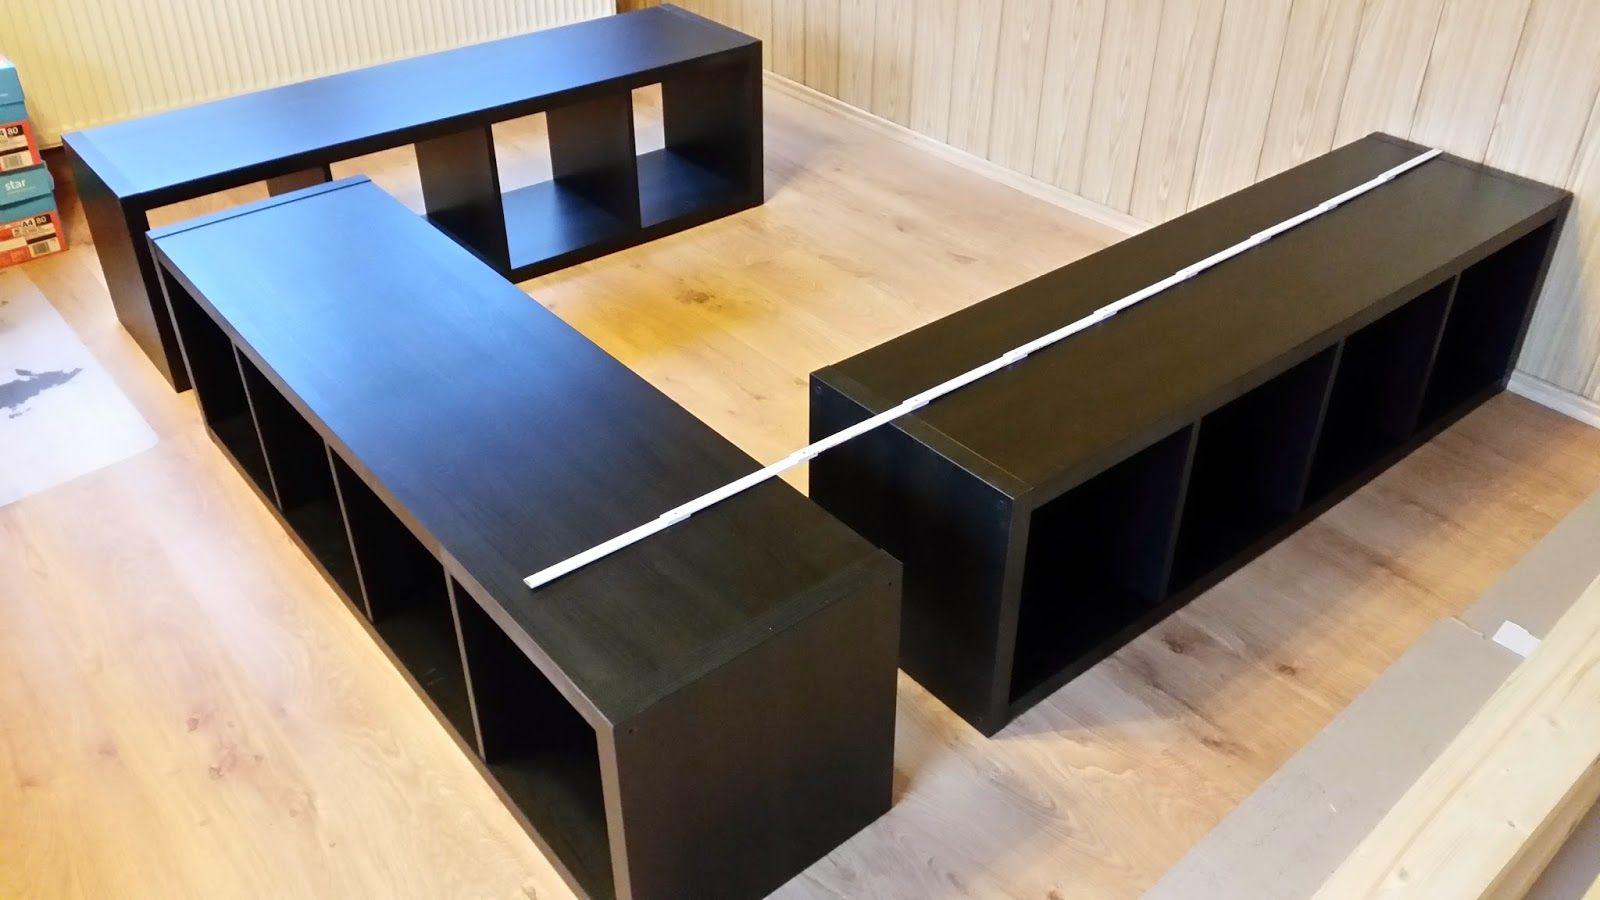 Kallax Bed Frame Dream Home Ideas Ikea Hack Ikea Bed Hack Kallax